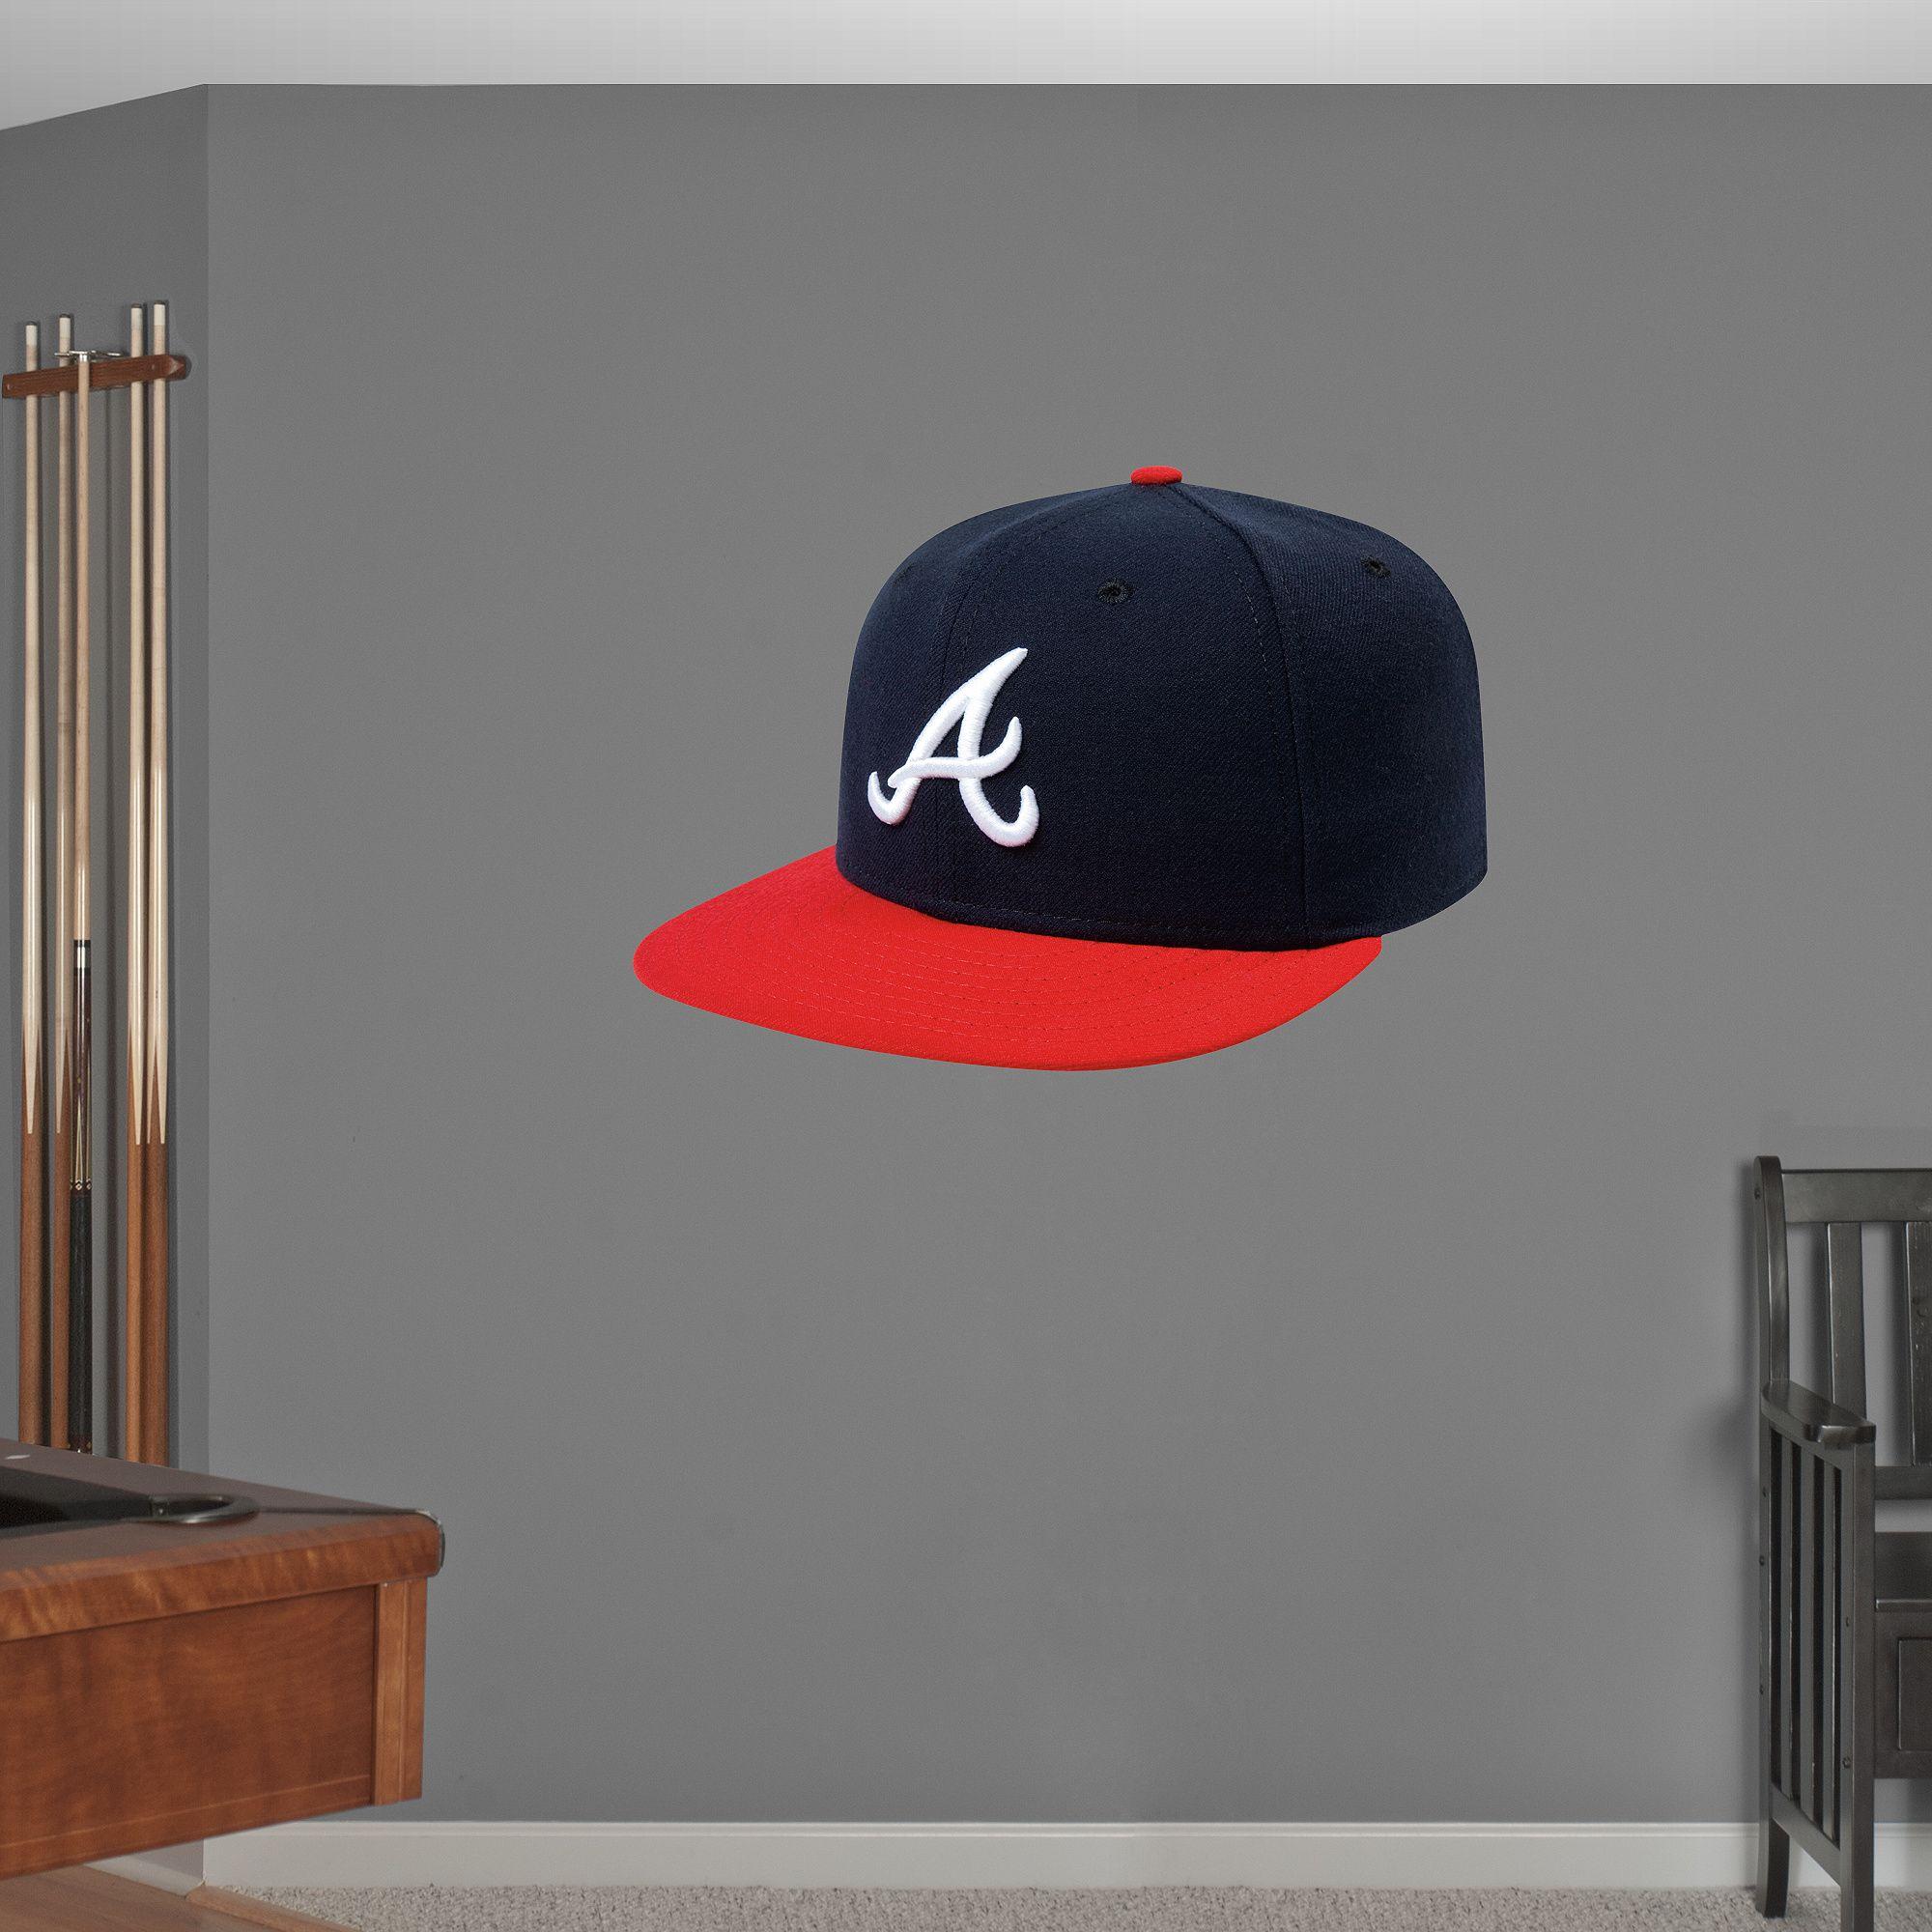 Atlanta Braves Cap Realbig Fathead Wall Graphic